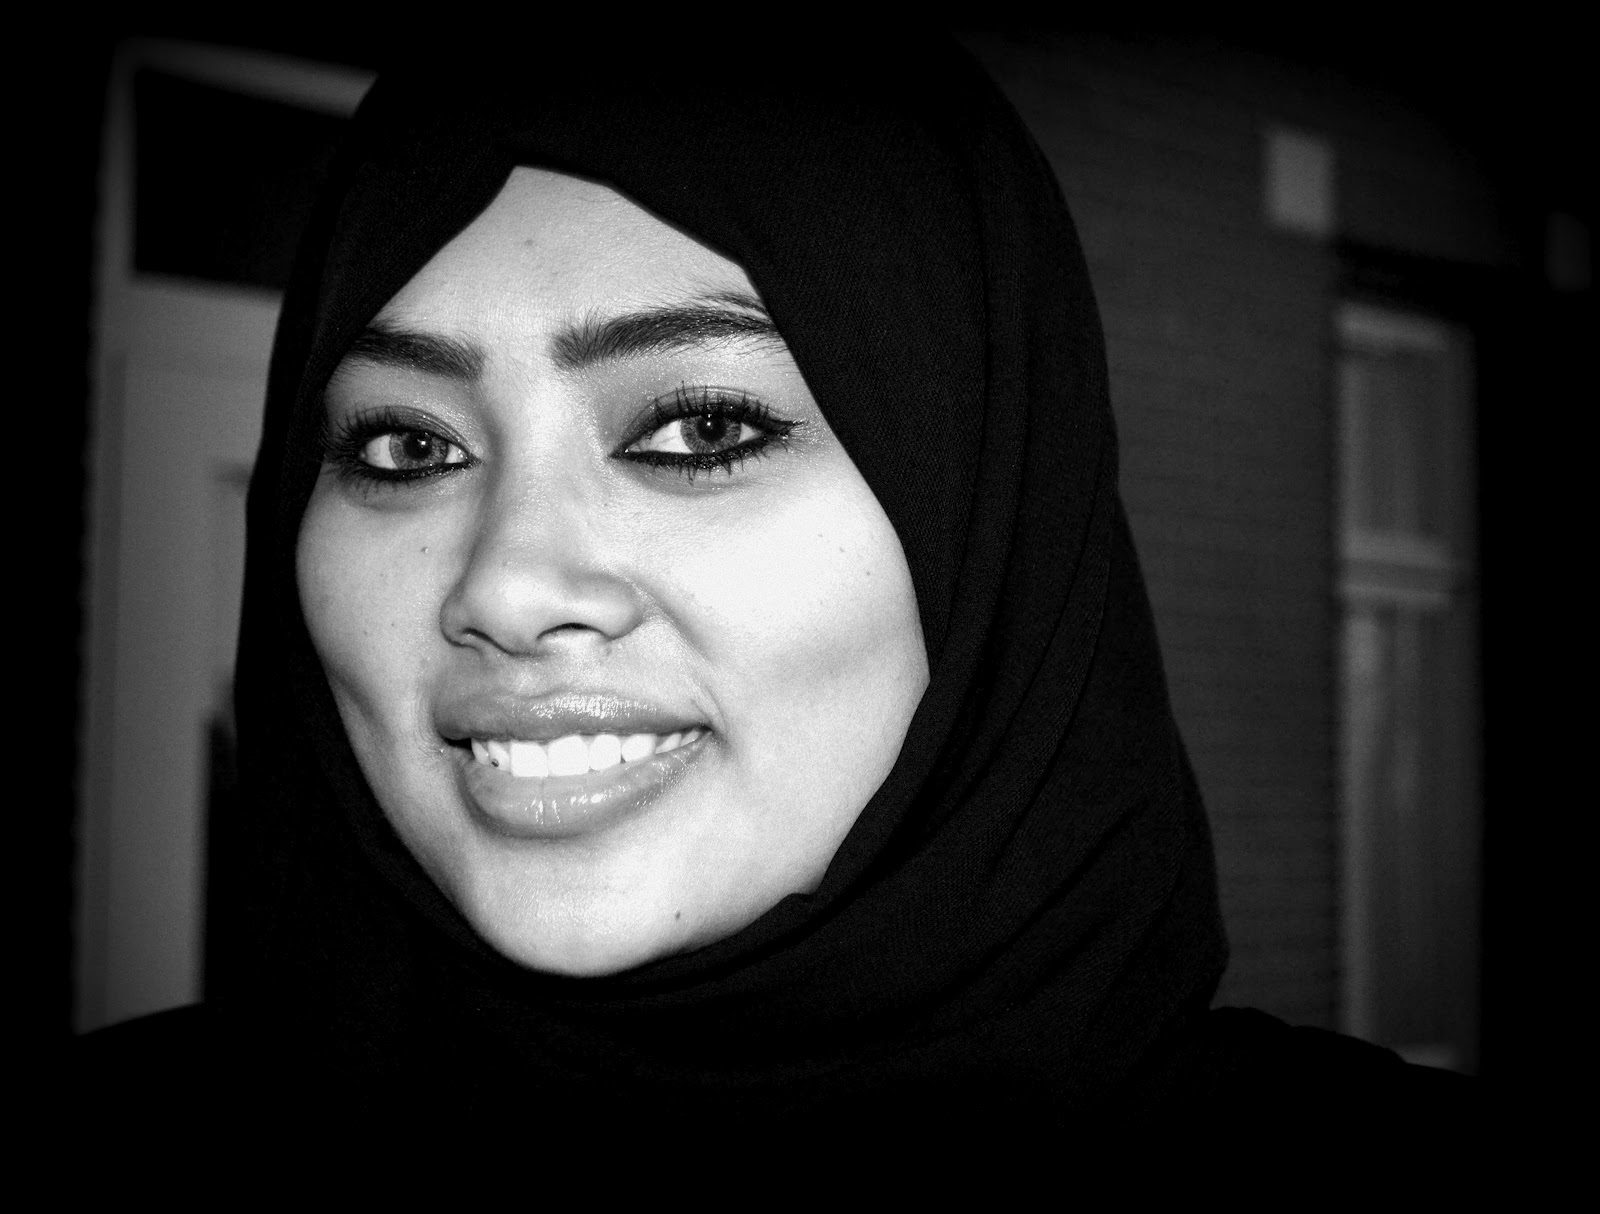 One Beauty Of Islam: Islam Through Photography